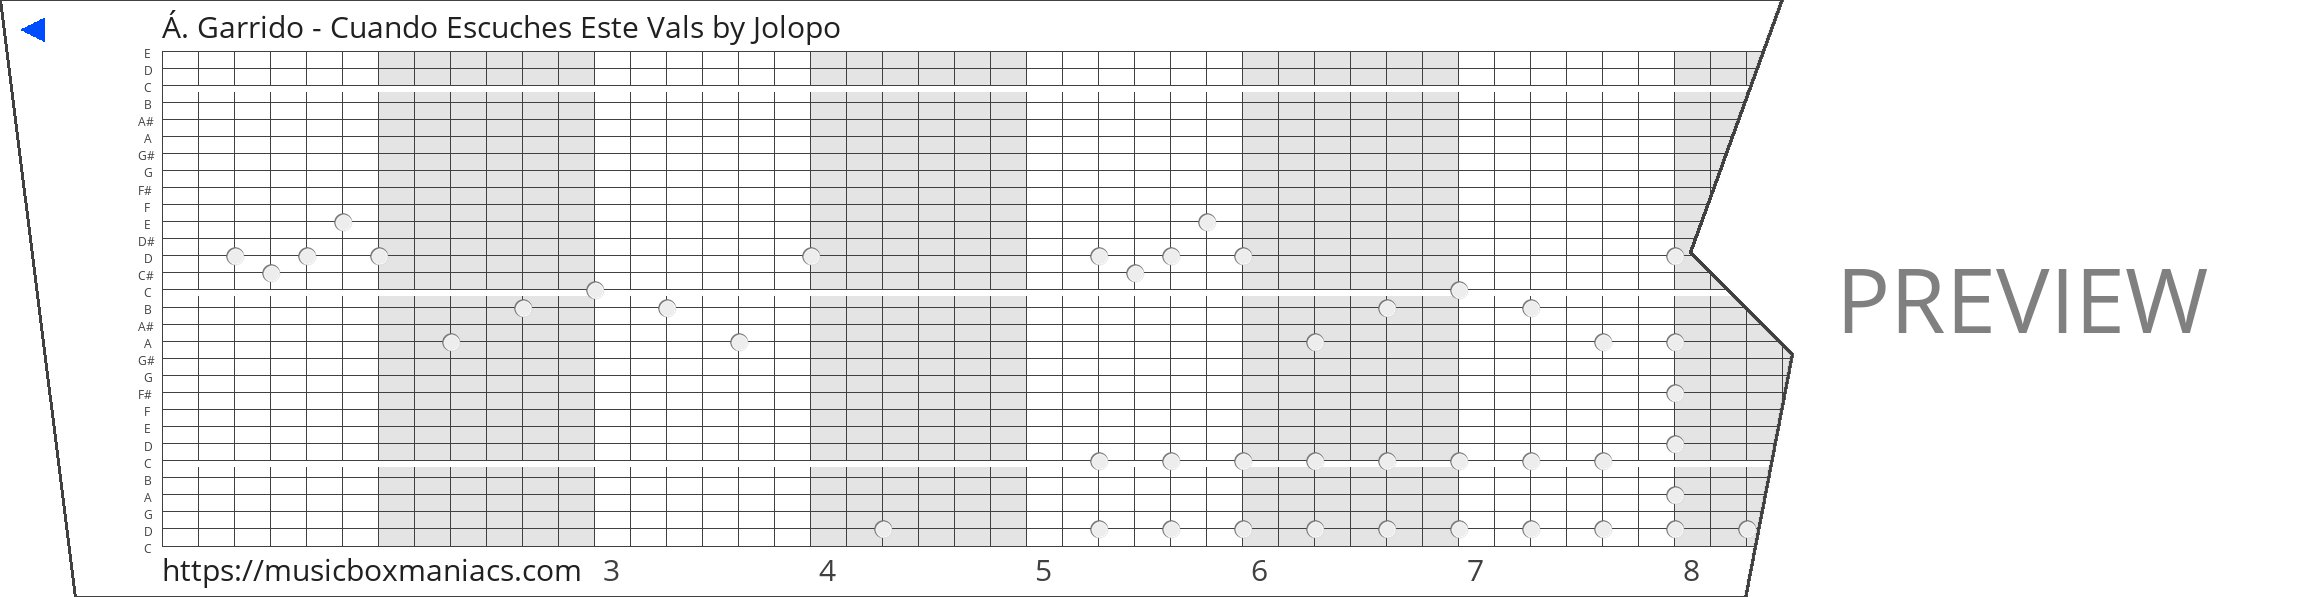 Á. Garrido - Cuando Escuches Este Vals 30 note music box paper strip